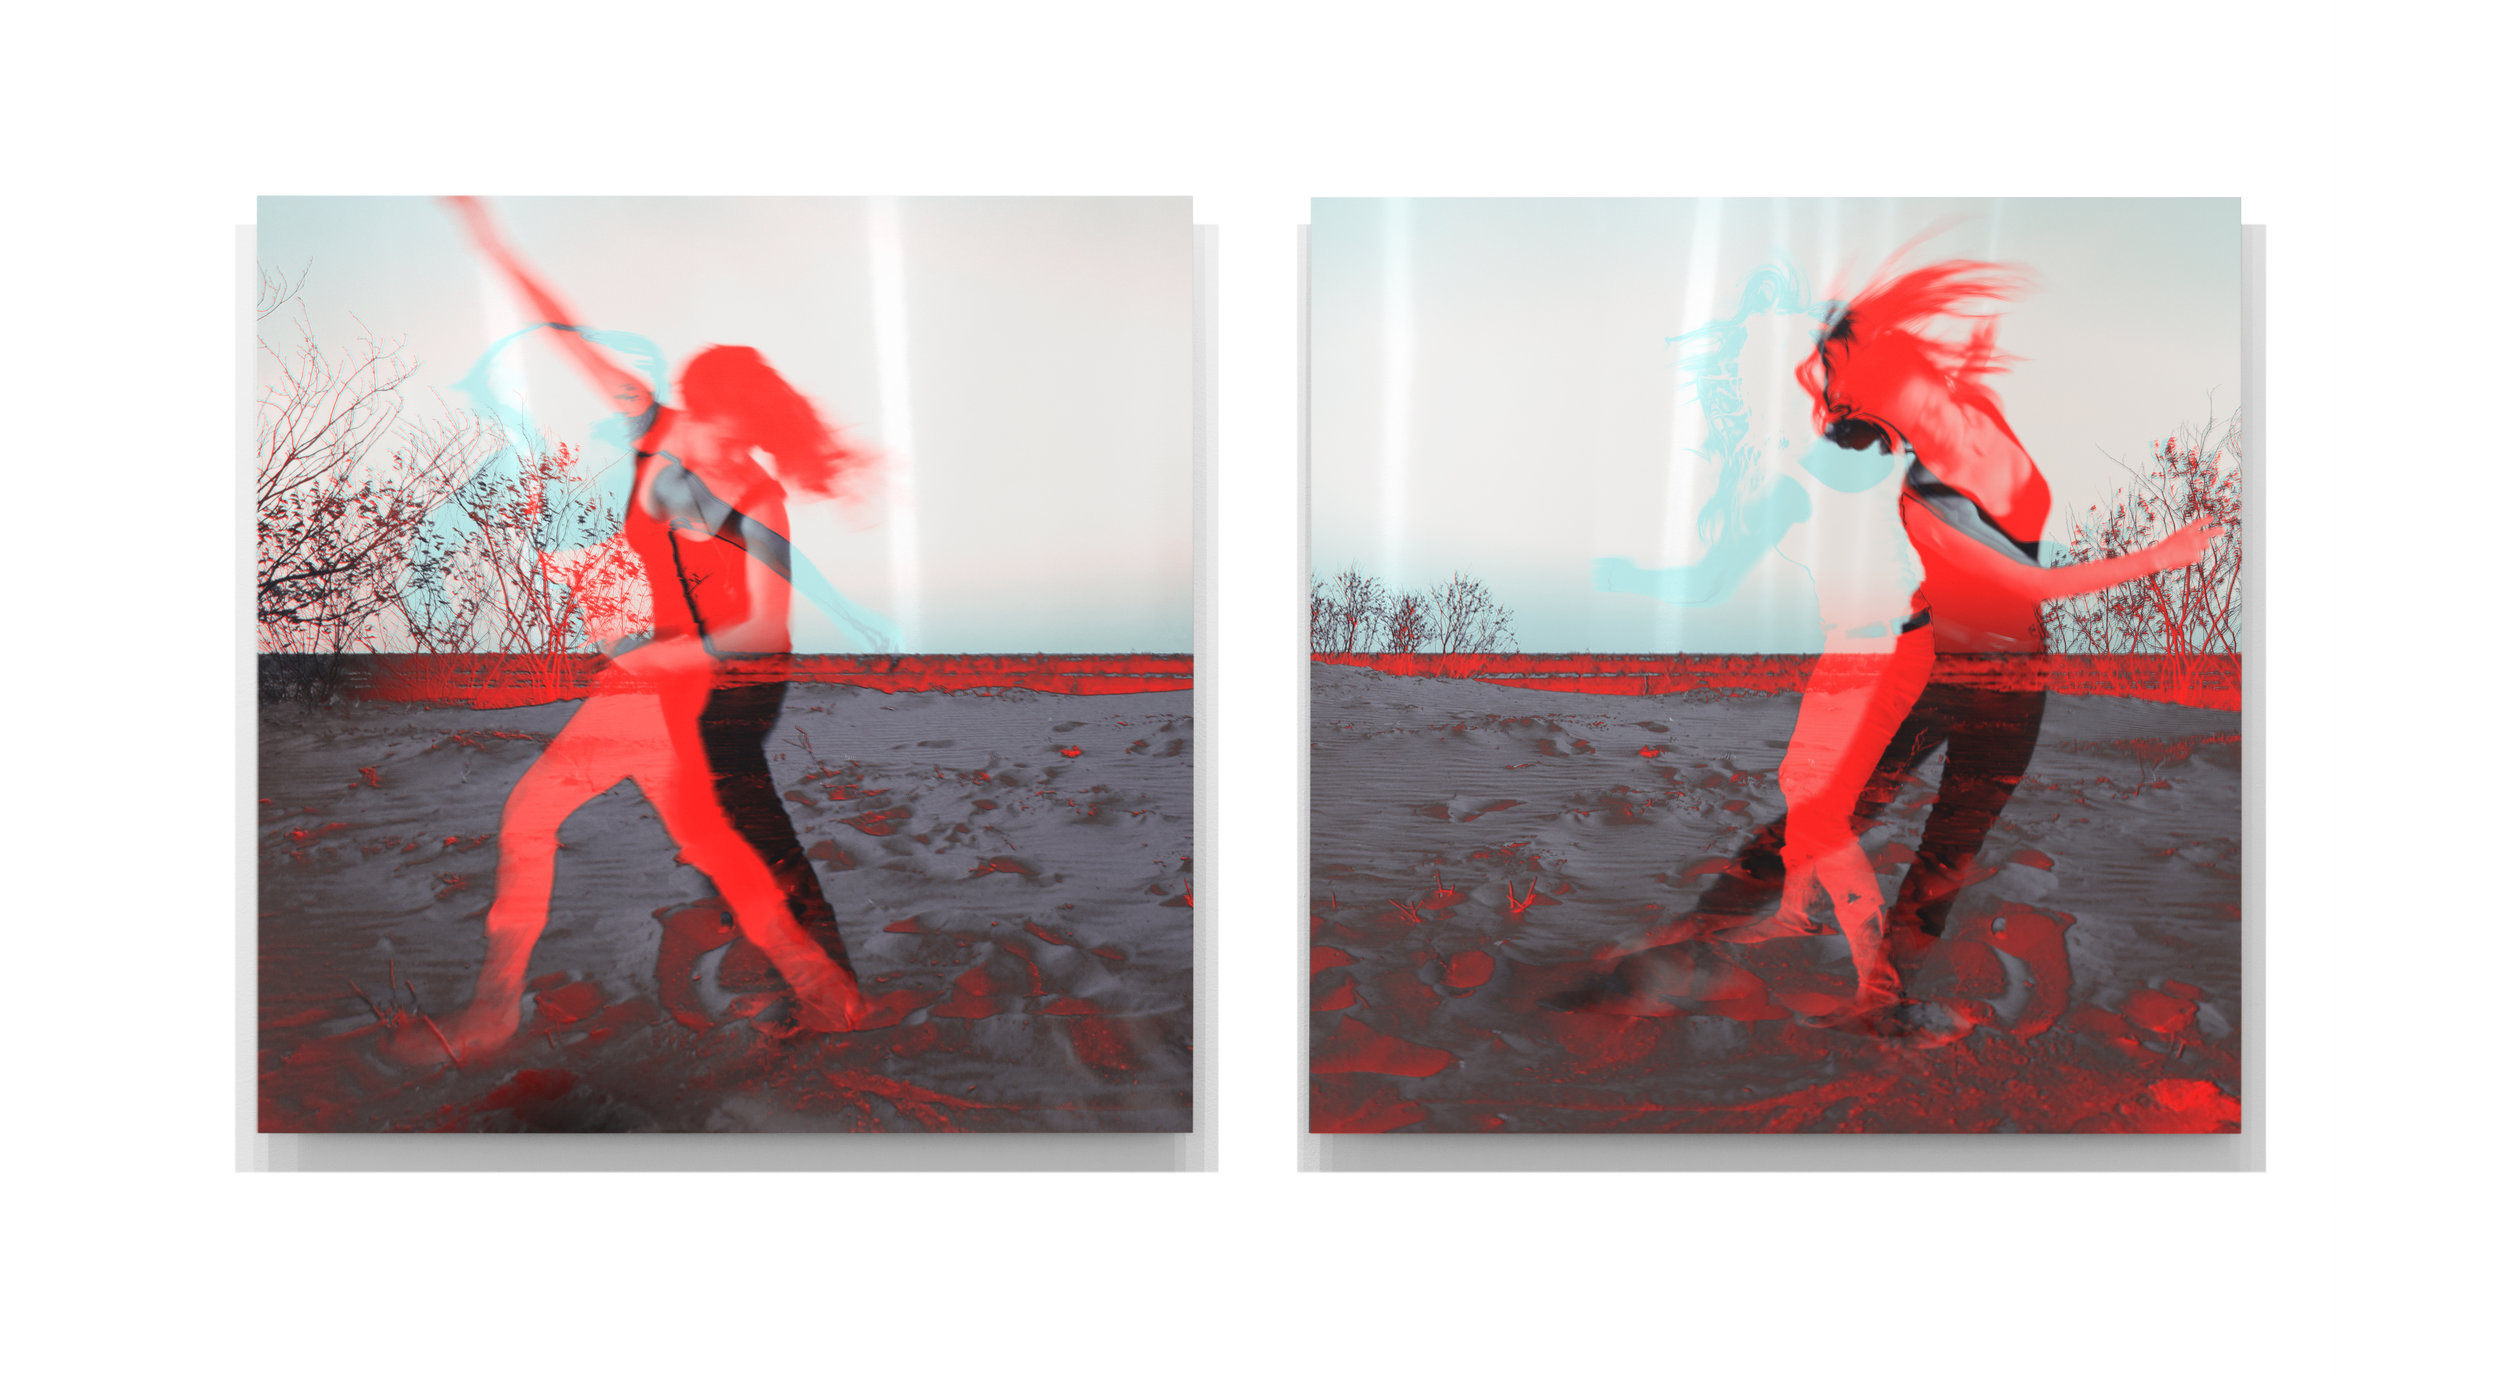 Sough   2013, enamel and pigment on aluminium, 80cm x 160cm, private collection